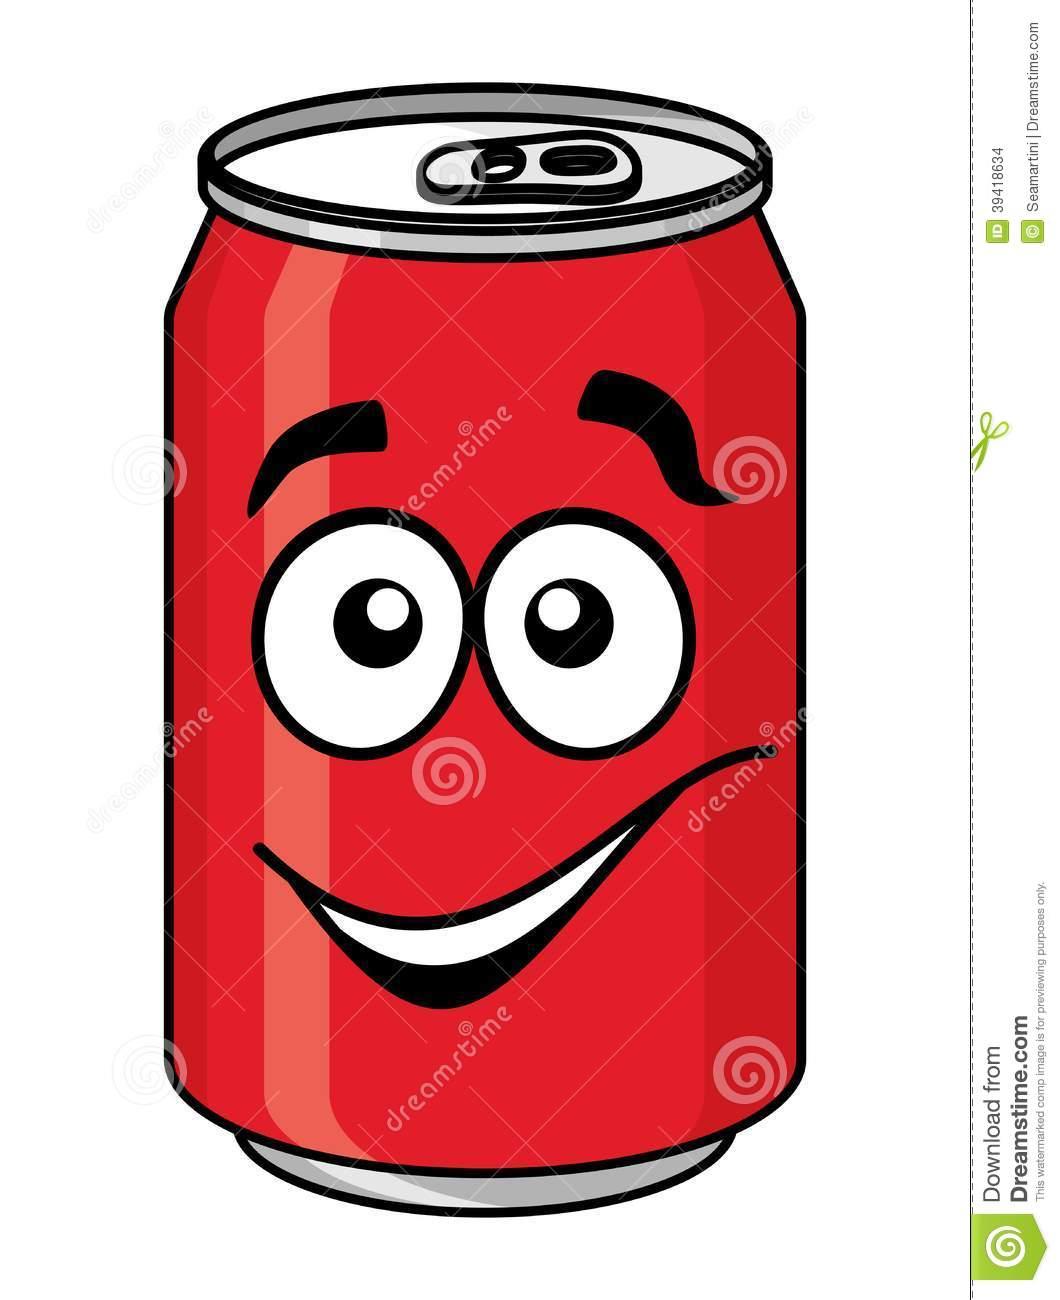 1940s Smiling Soda Jerk Stock Photo | Getty Images